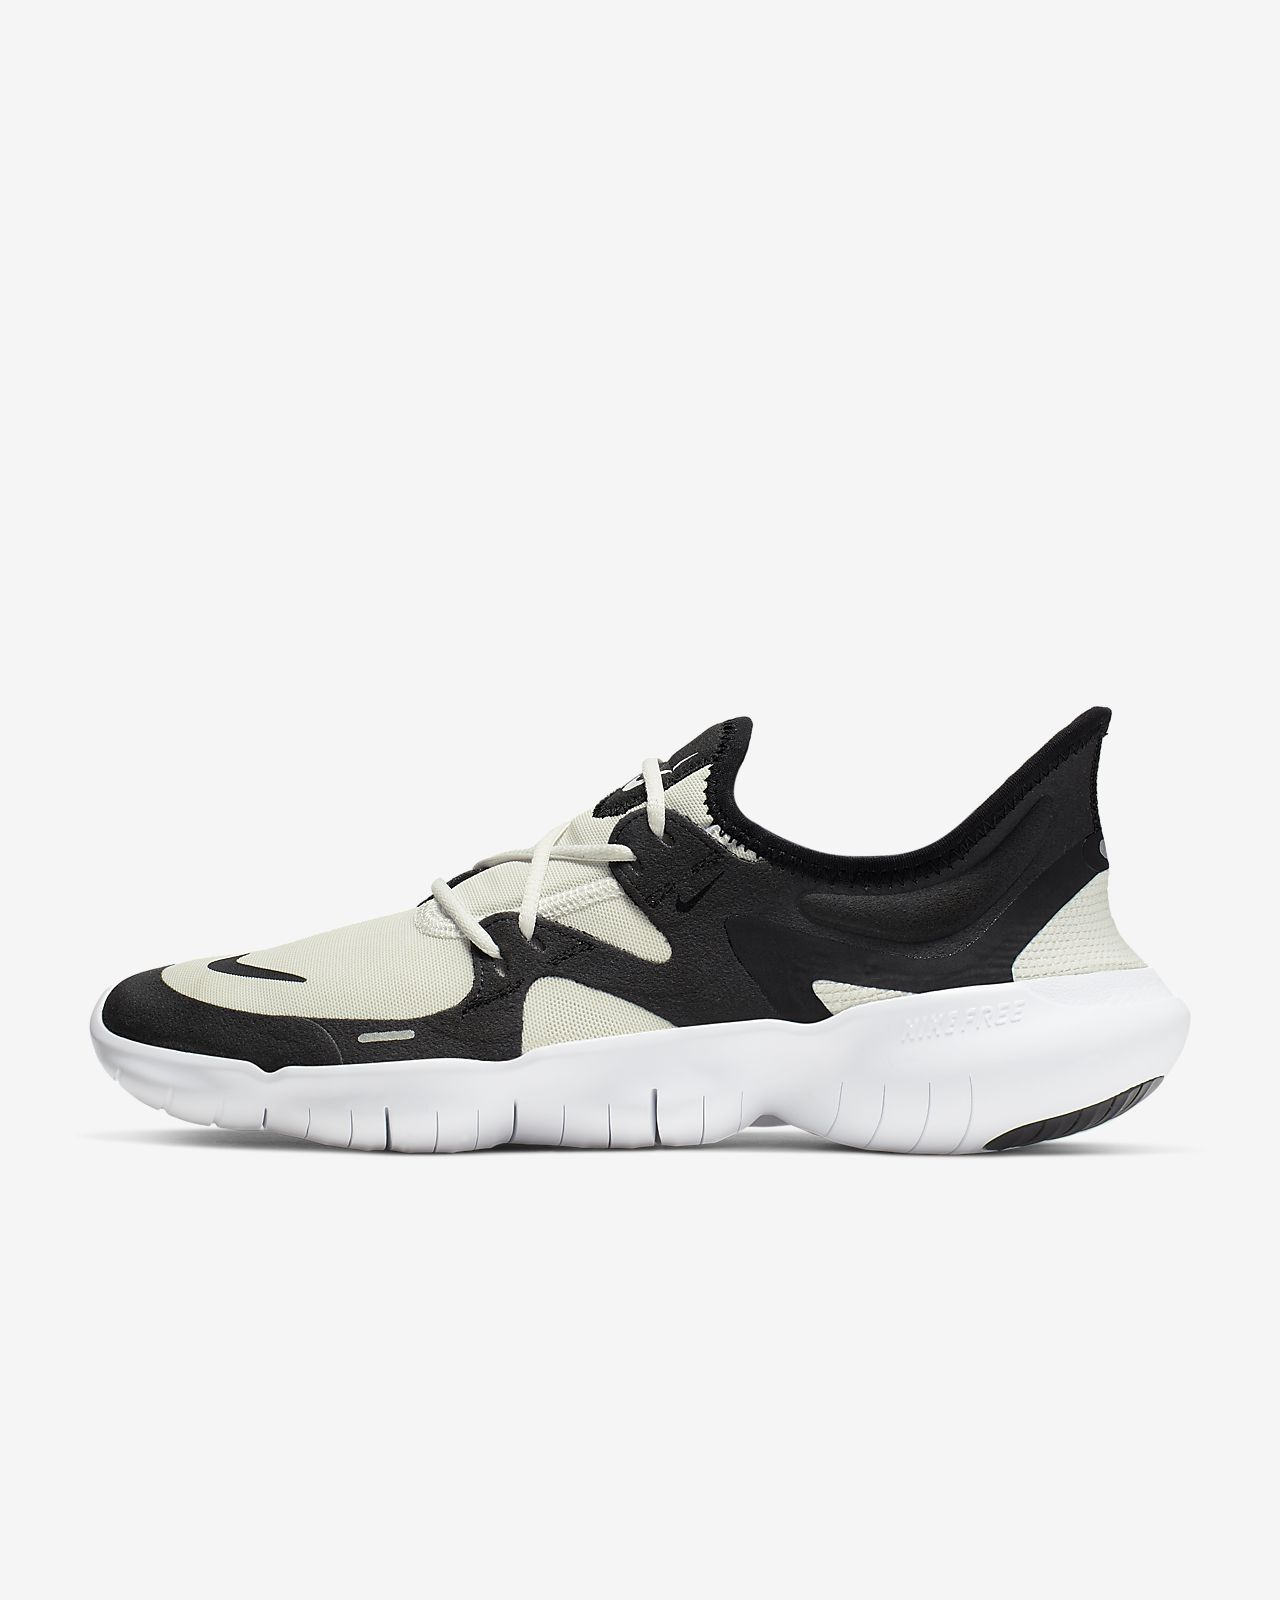 Rn De Pour 5 0 Free Running Nike Femme Chaussure kOPXN8n0w